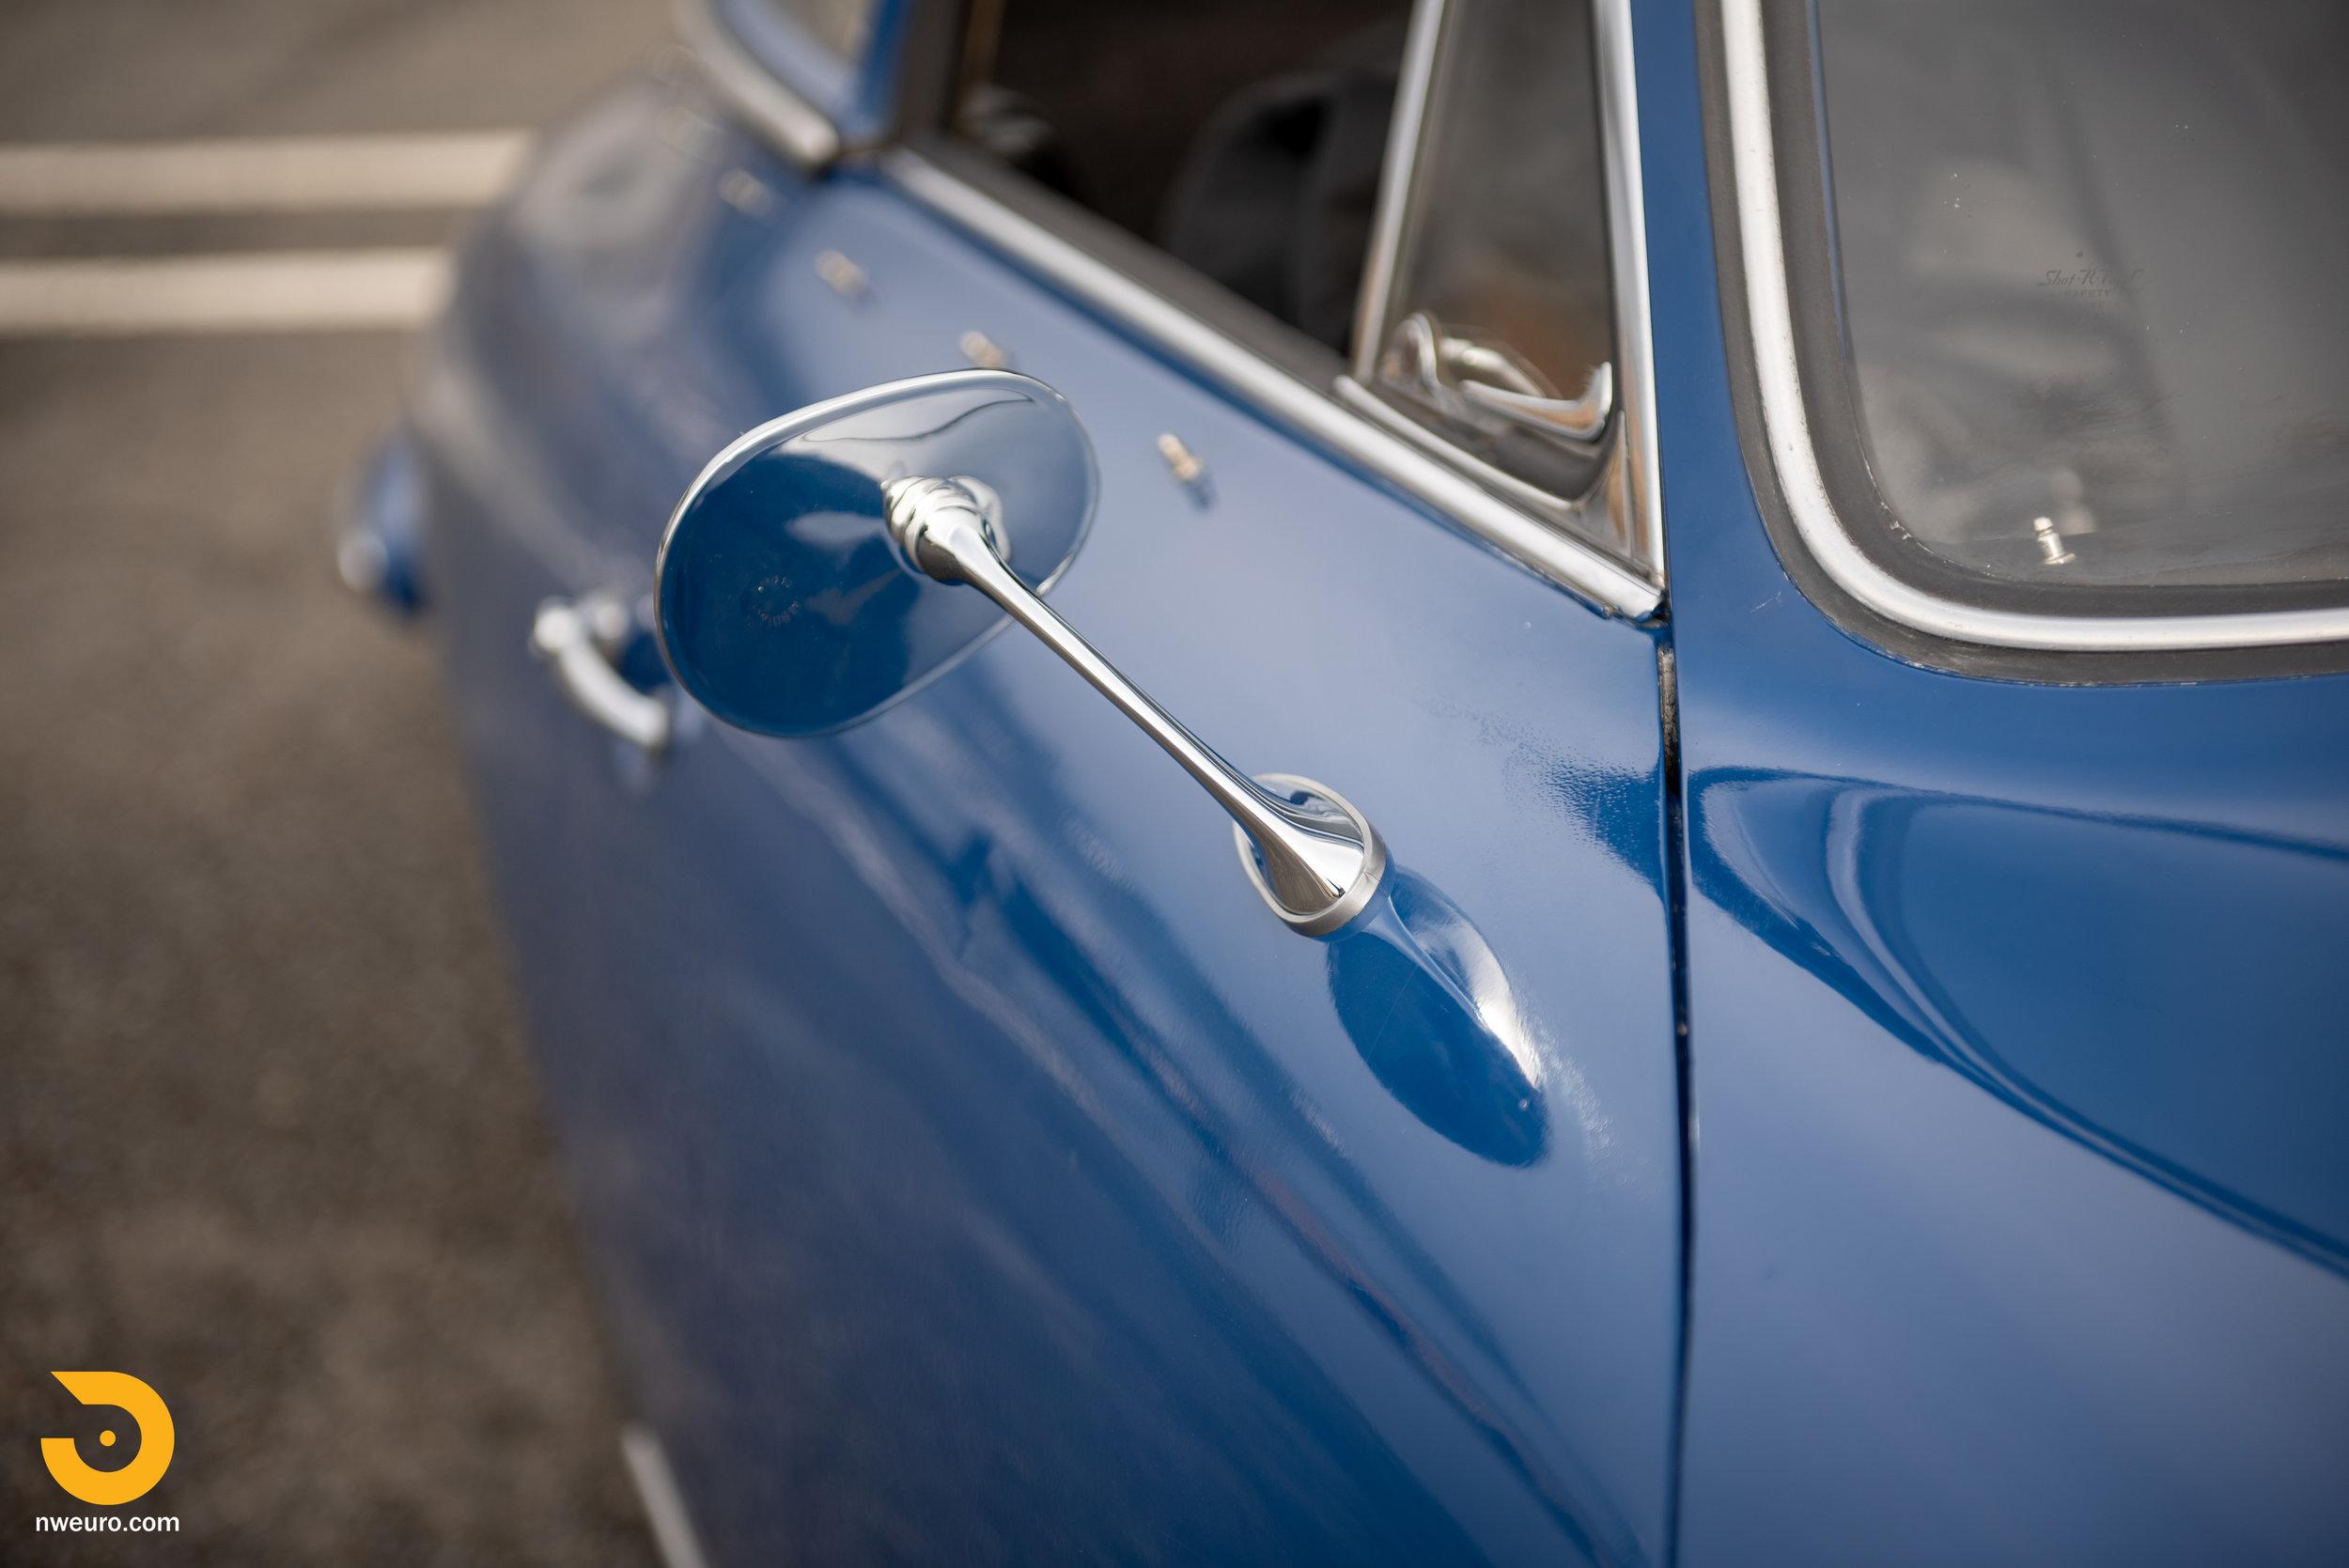 1960 Porsche 356 Hardtop Cab 1600 Super-34.jpg